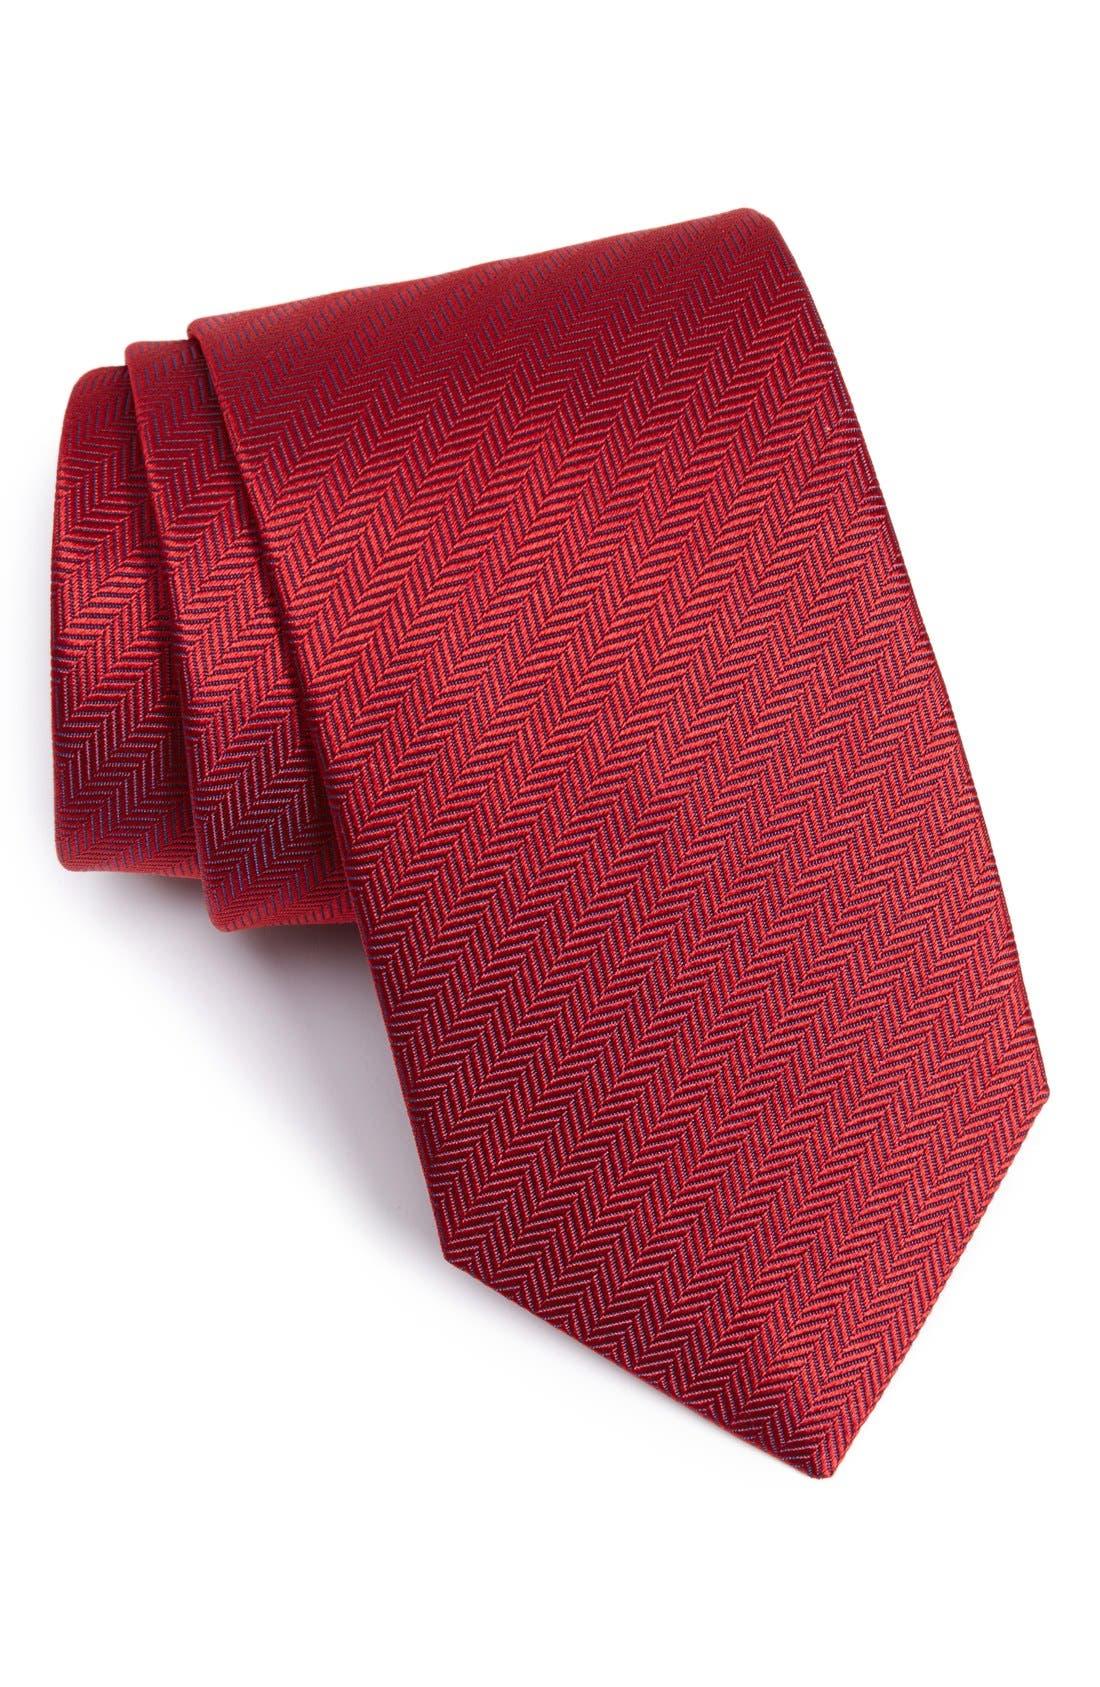 Eton Herringbone Textured Silk Tie